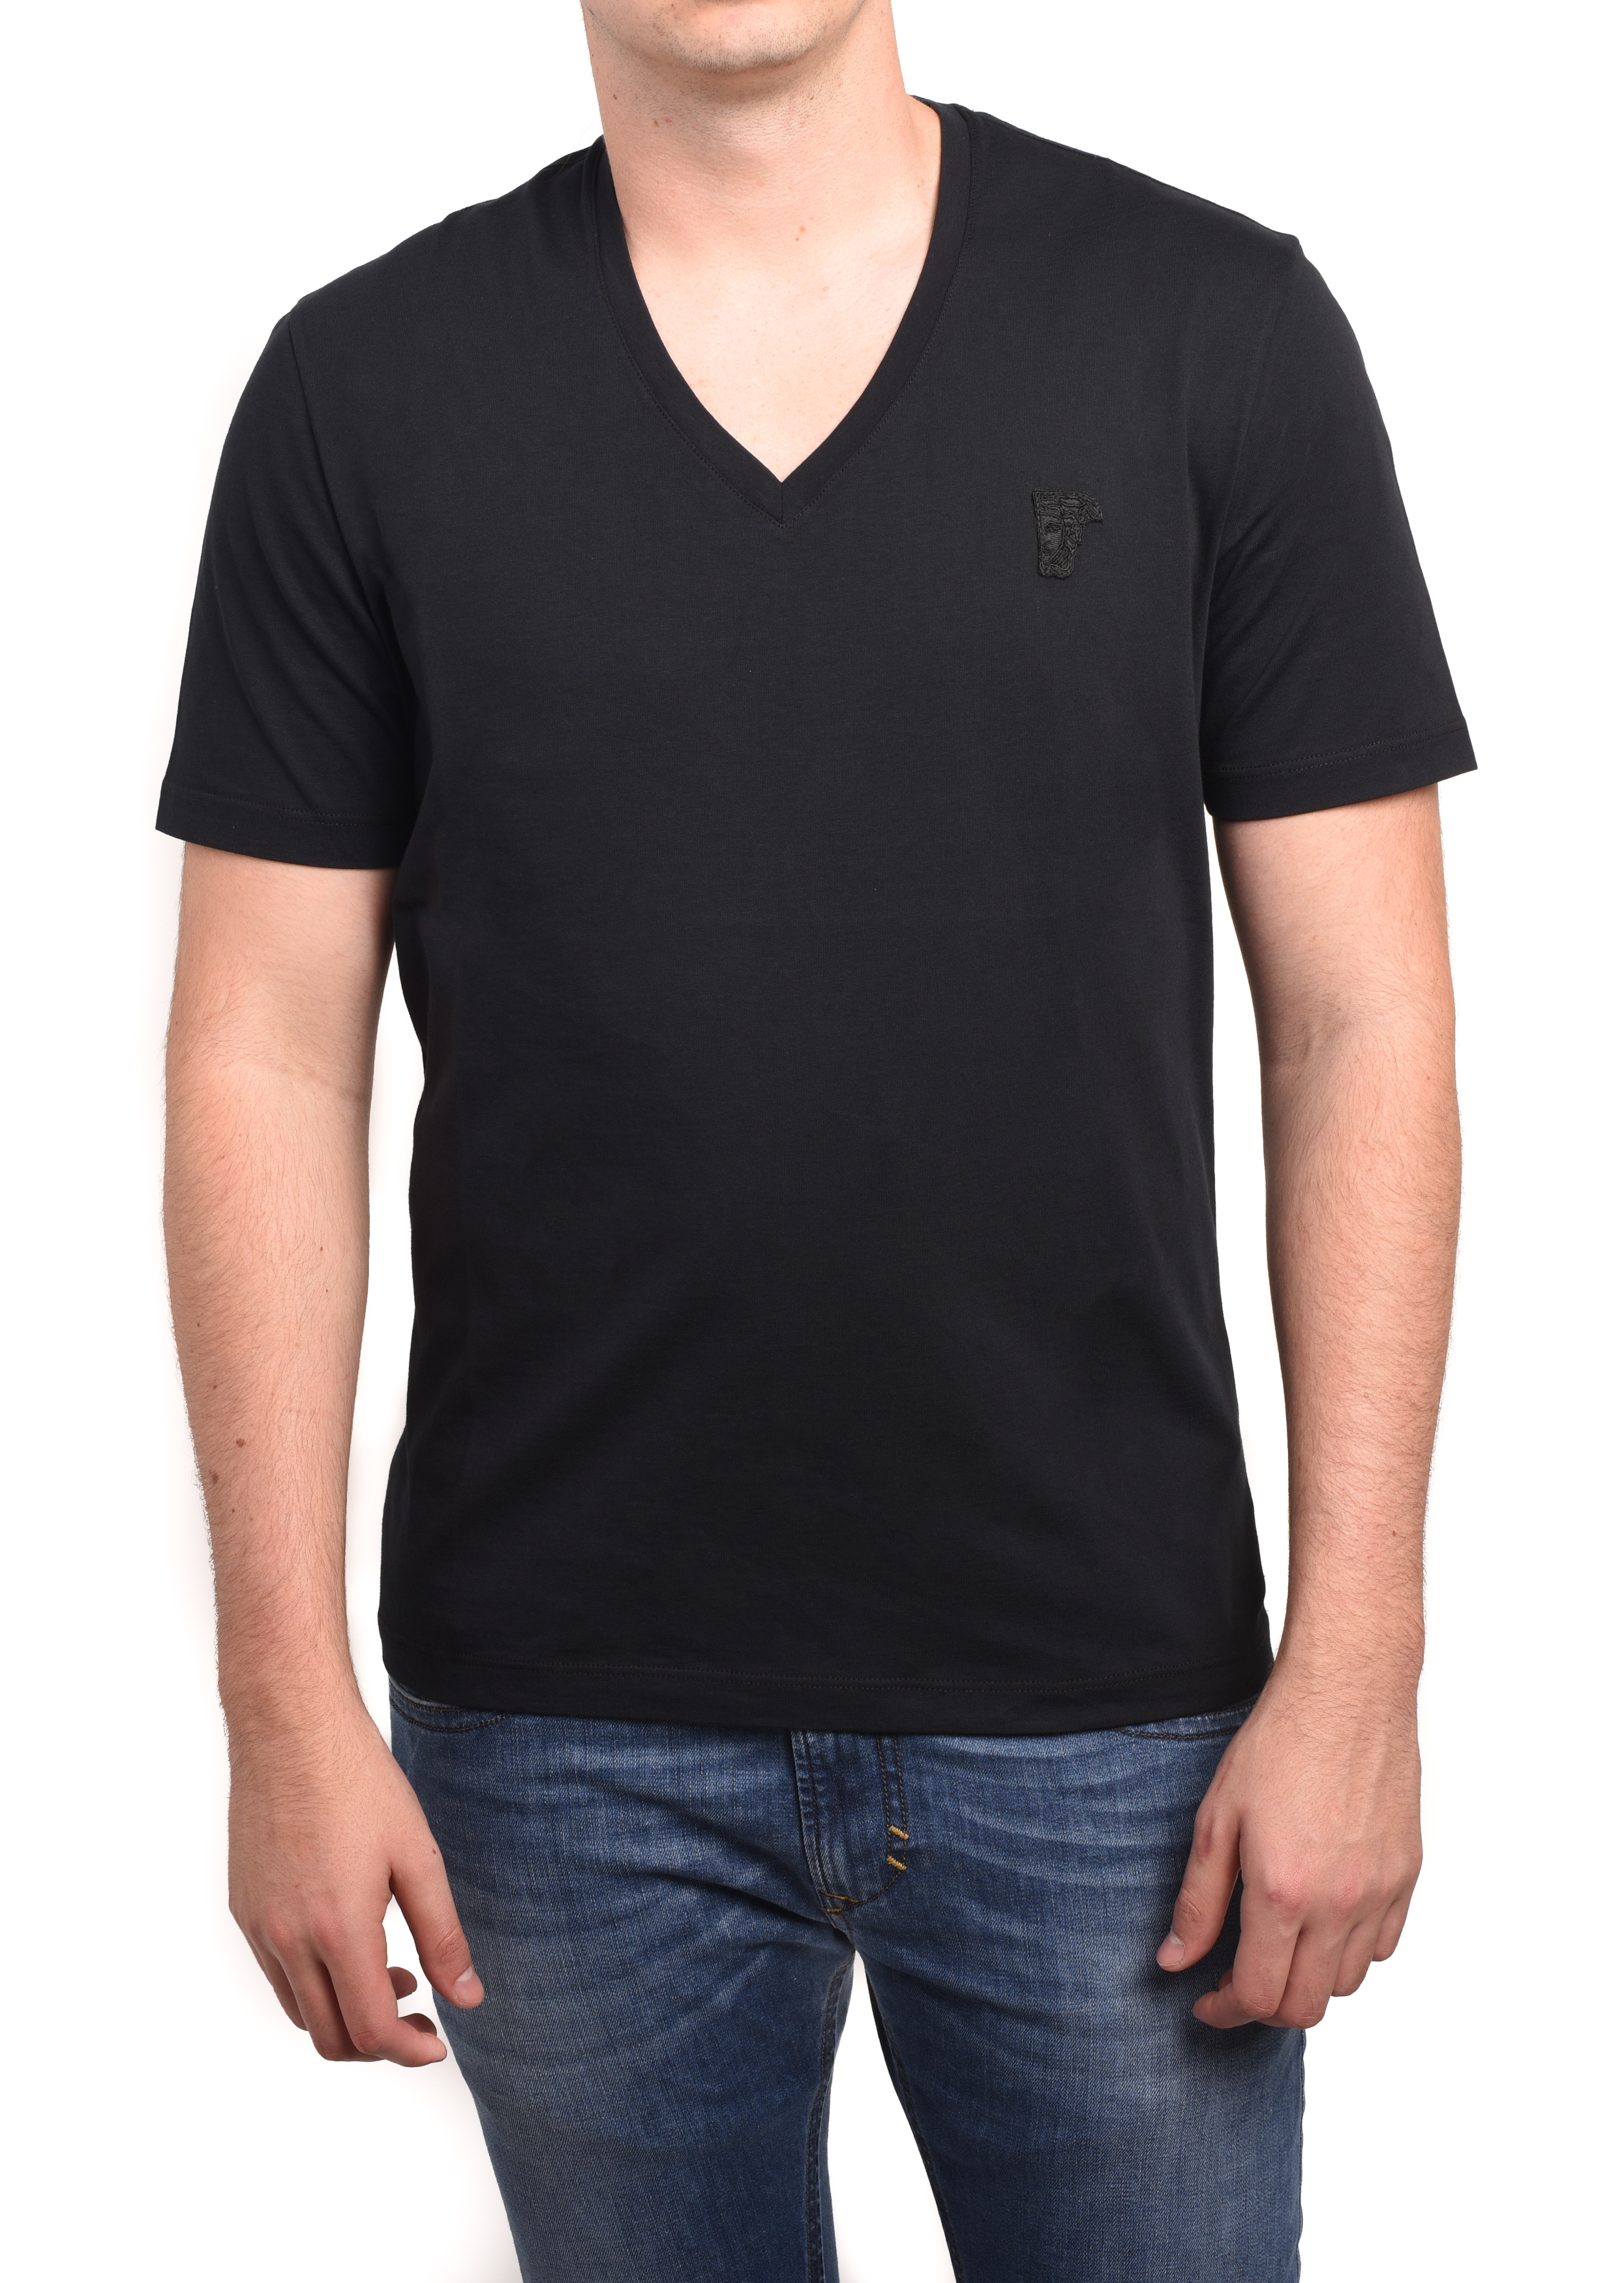 9e69c5e8 Versace Collection Men Medusa V-Neck Tee T-Shirt Black